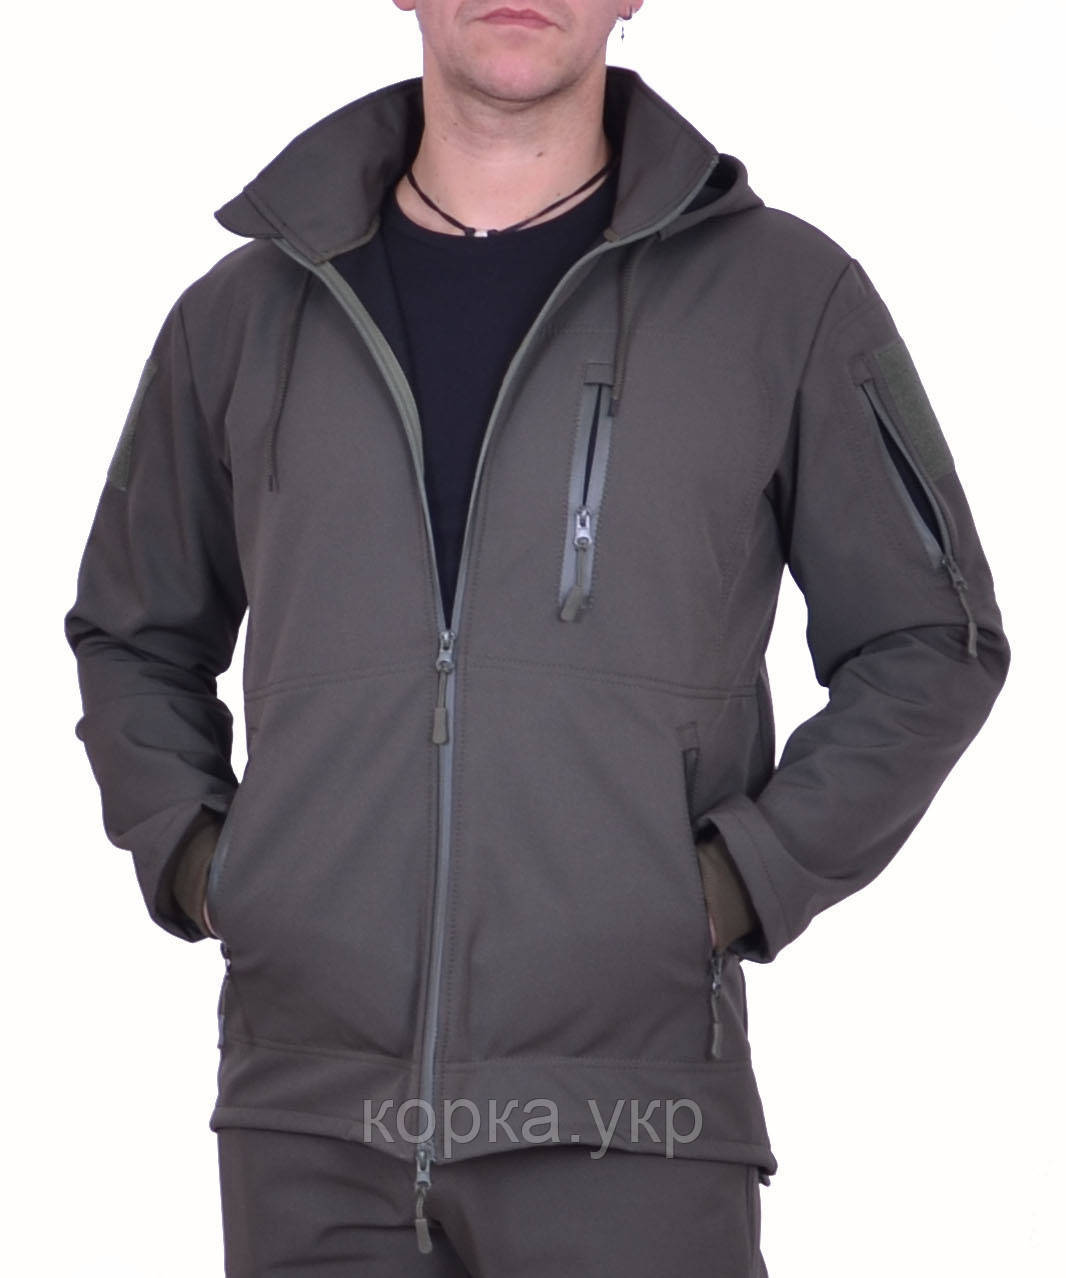 Куртка SOFT SHELL Хаки с боковыми молниями под кобуру